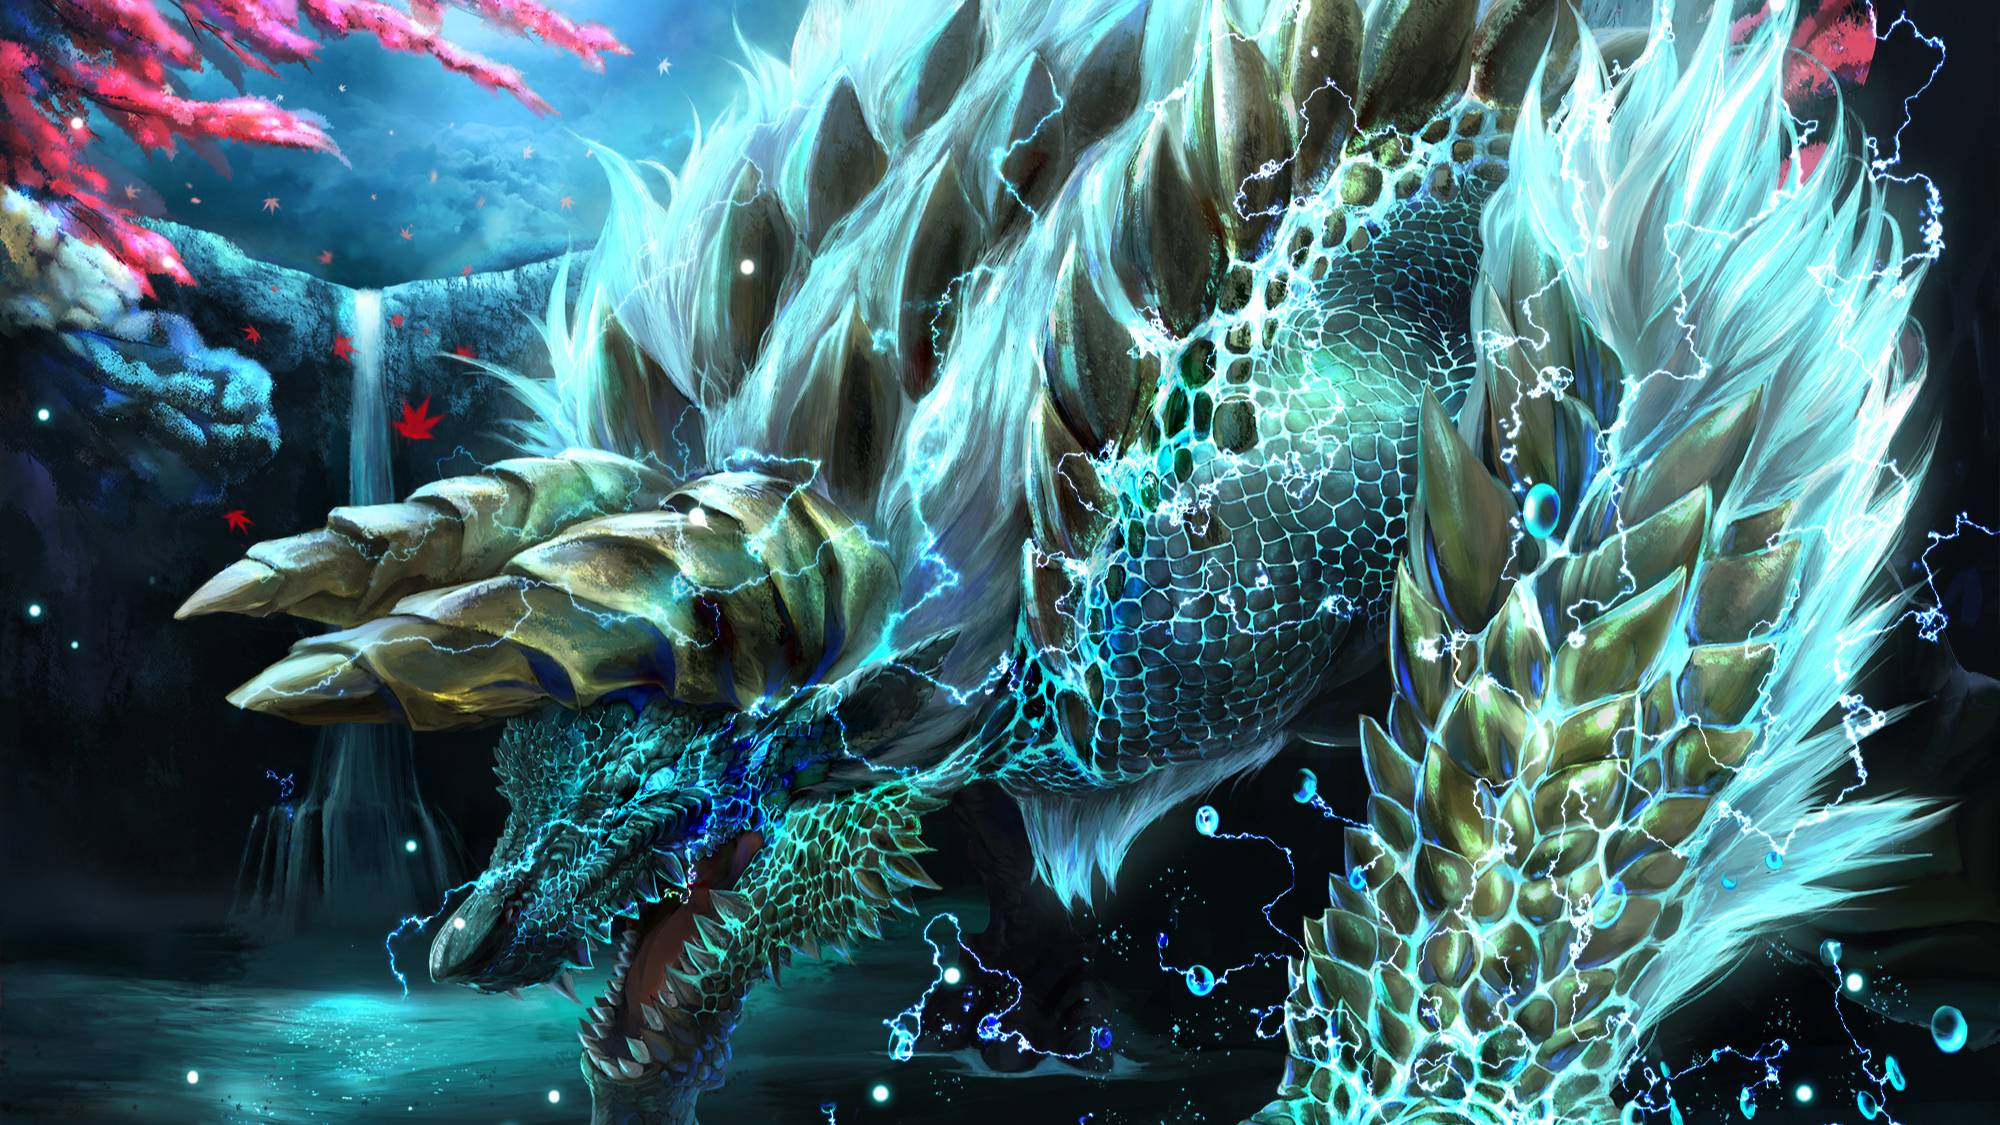 【MHWIB】【赤龙重弩三分半模块化狩猎斗技场雷狼龙(含减掉落物时间)】